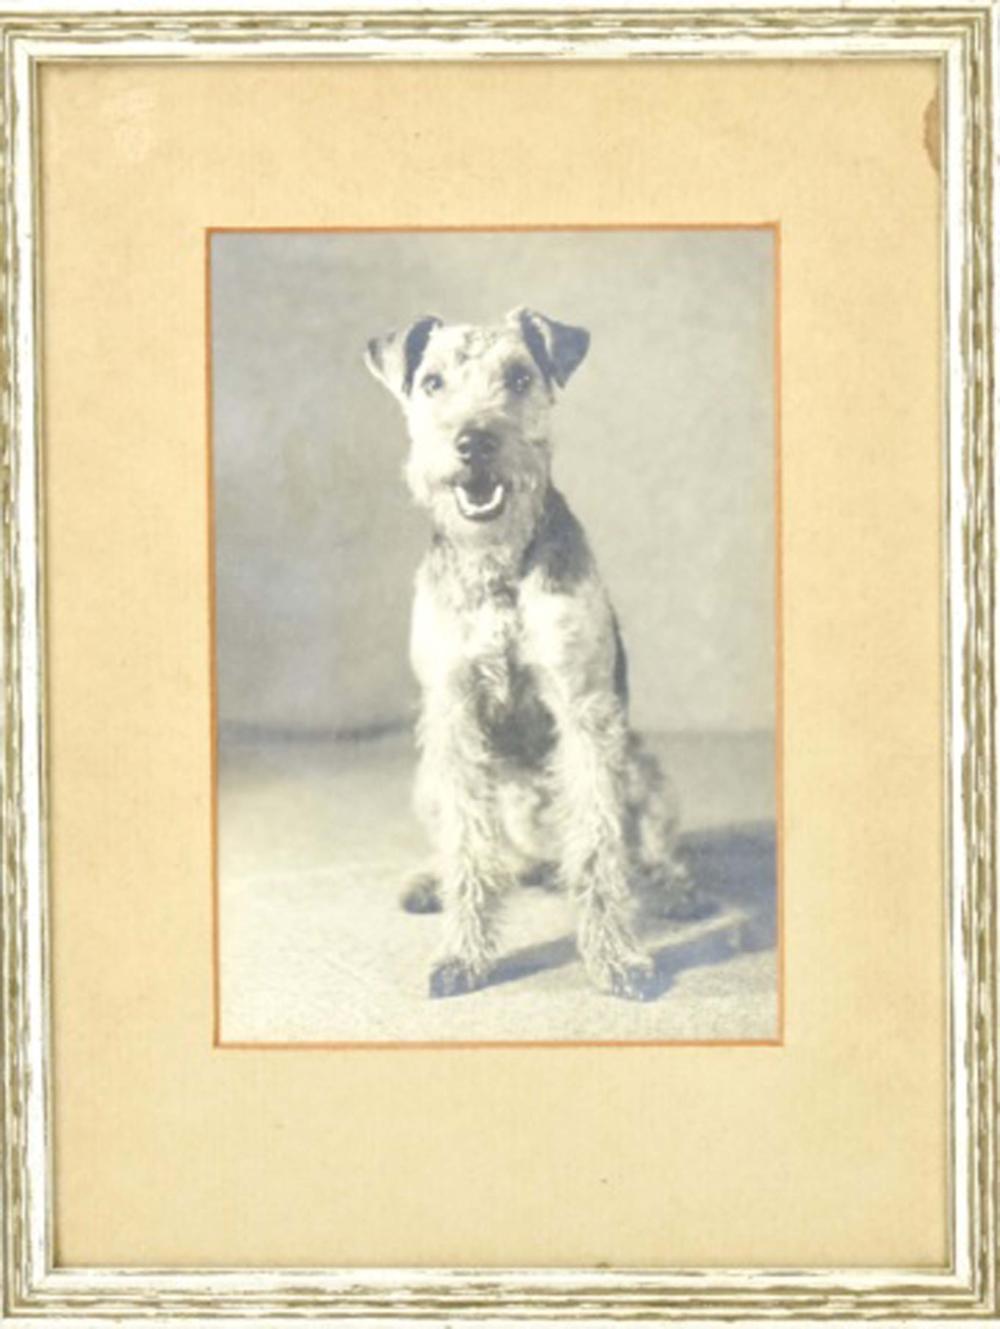 Antique C 1900 Framed Photograph of a Dog